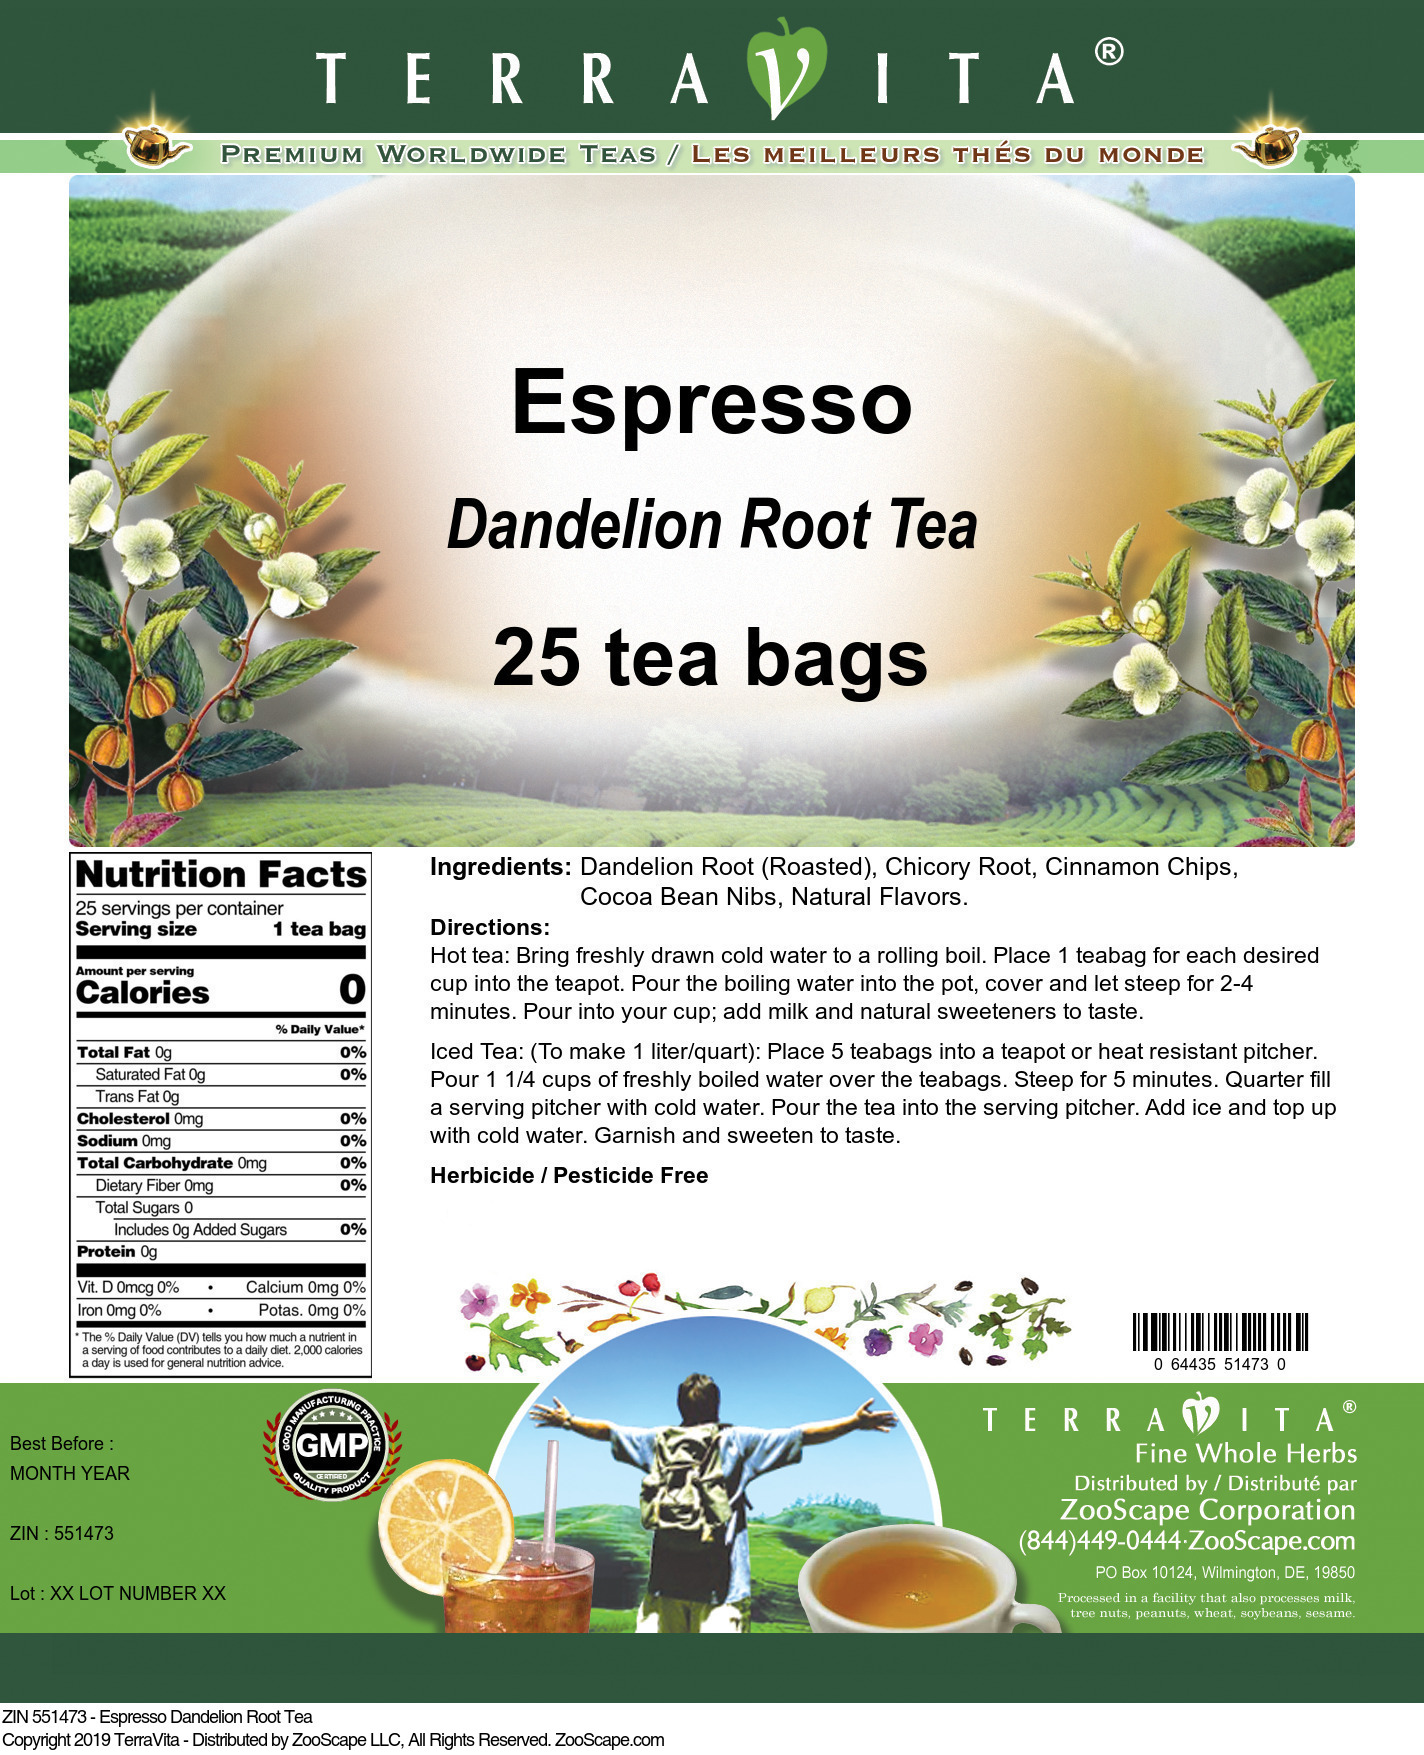 Espresso Dandelion Root